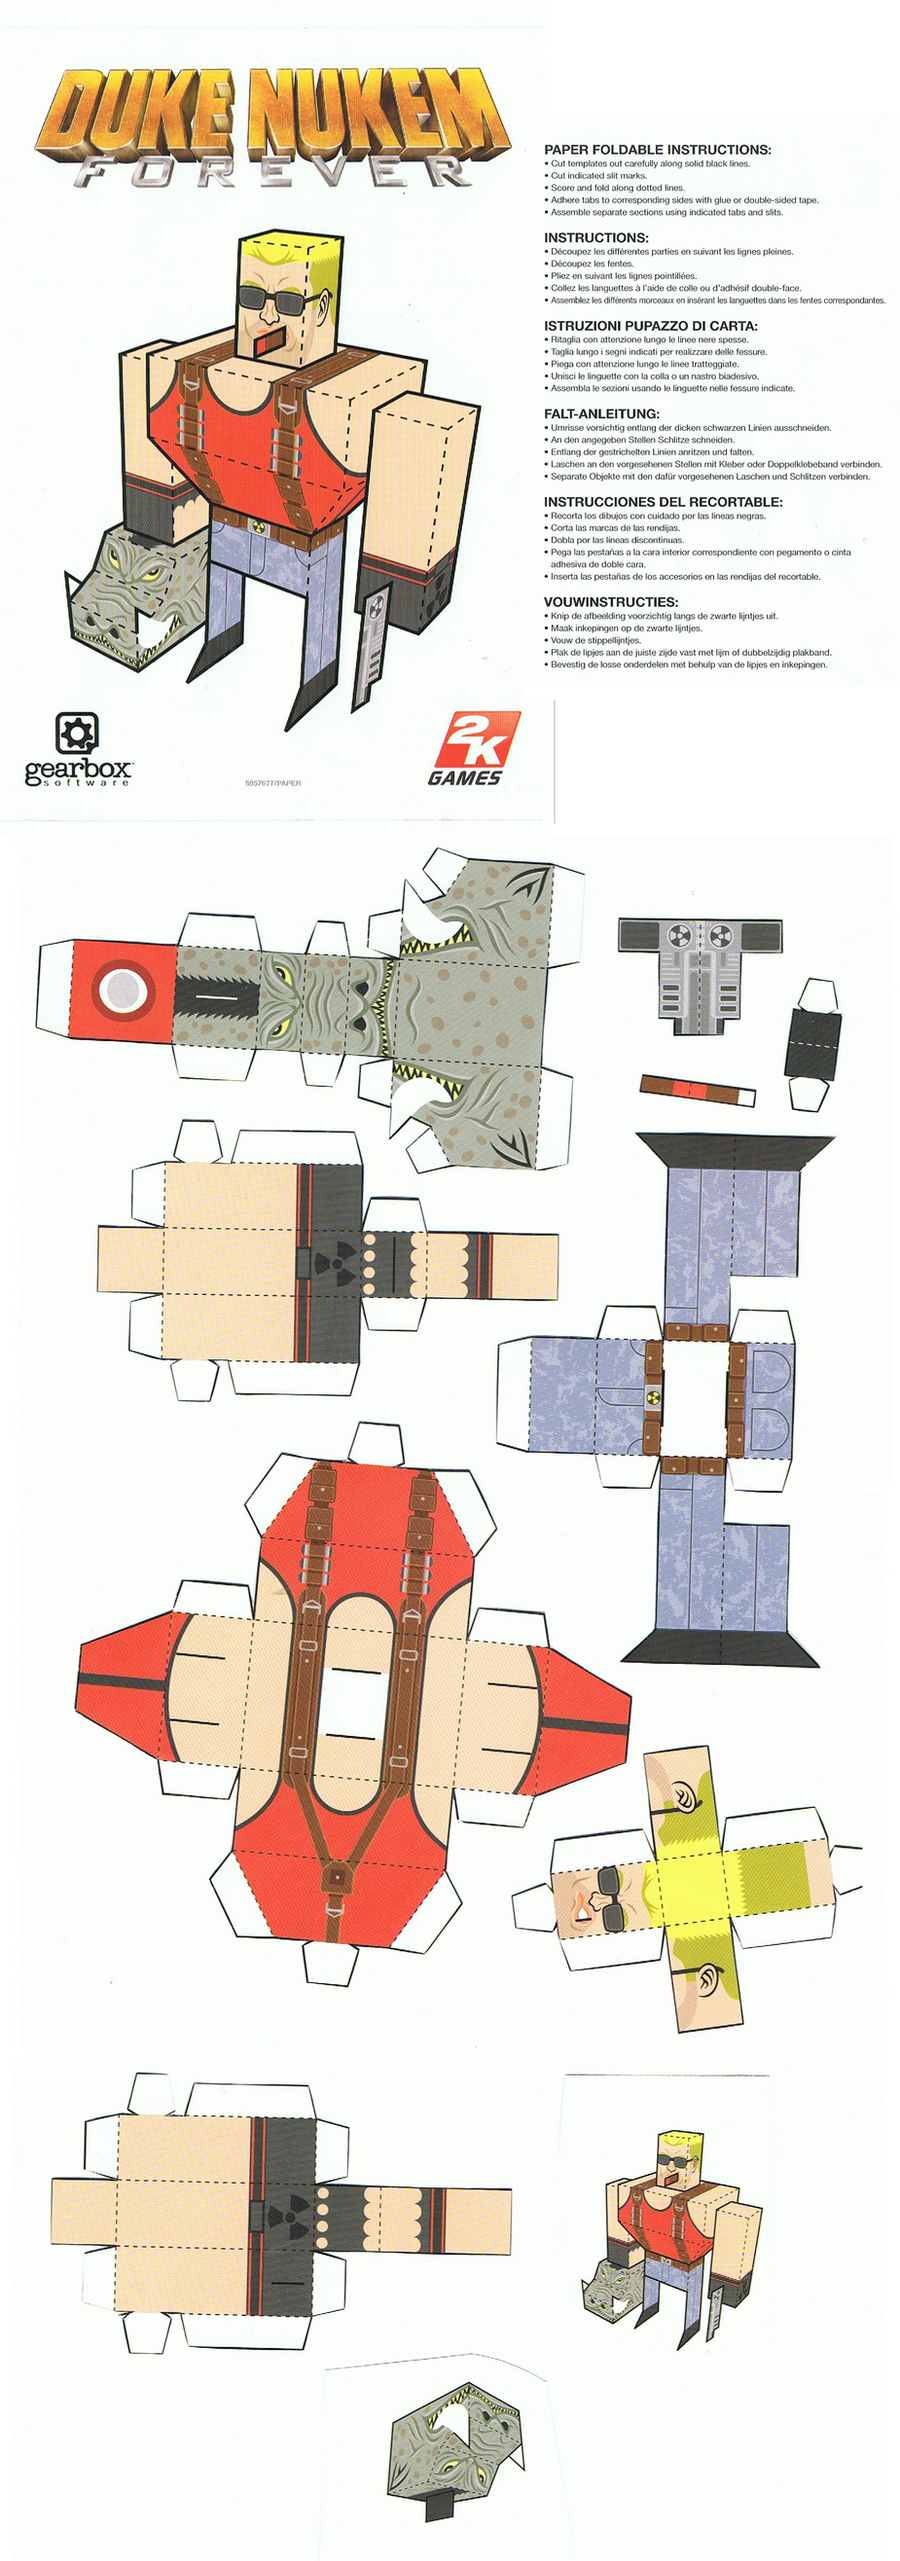 Duke Nukem Forever papercraft by chiefwrigley